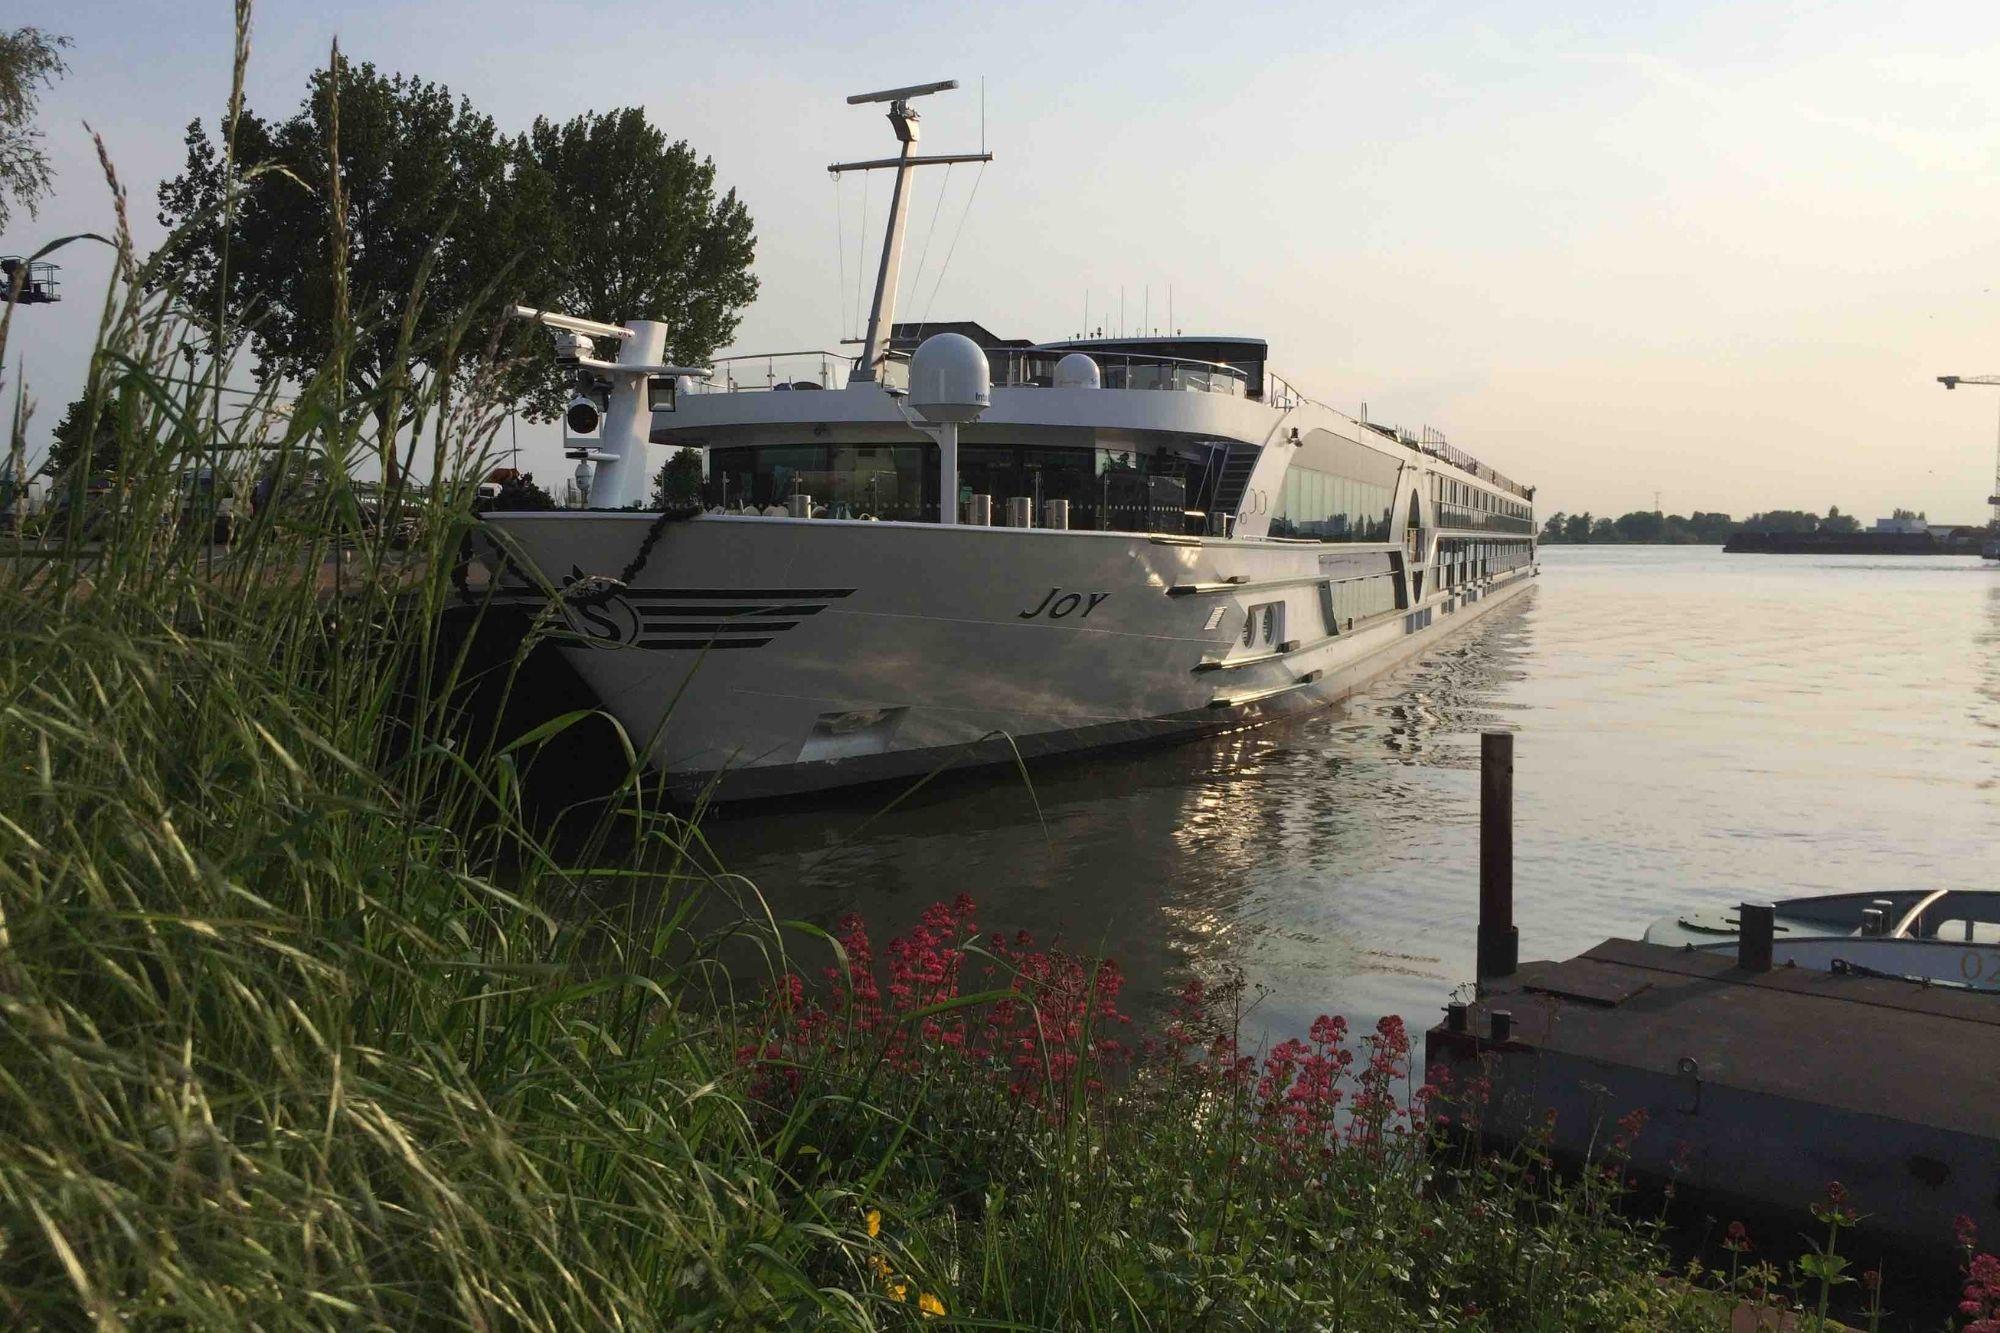 VIVA Cruises: MS JOY als neues Schiff auf der Donau